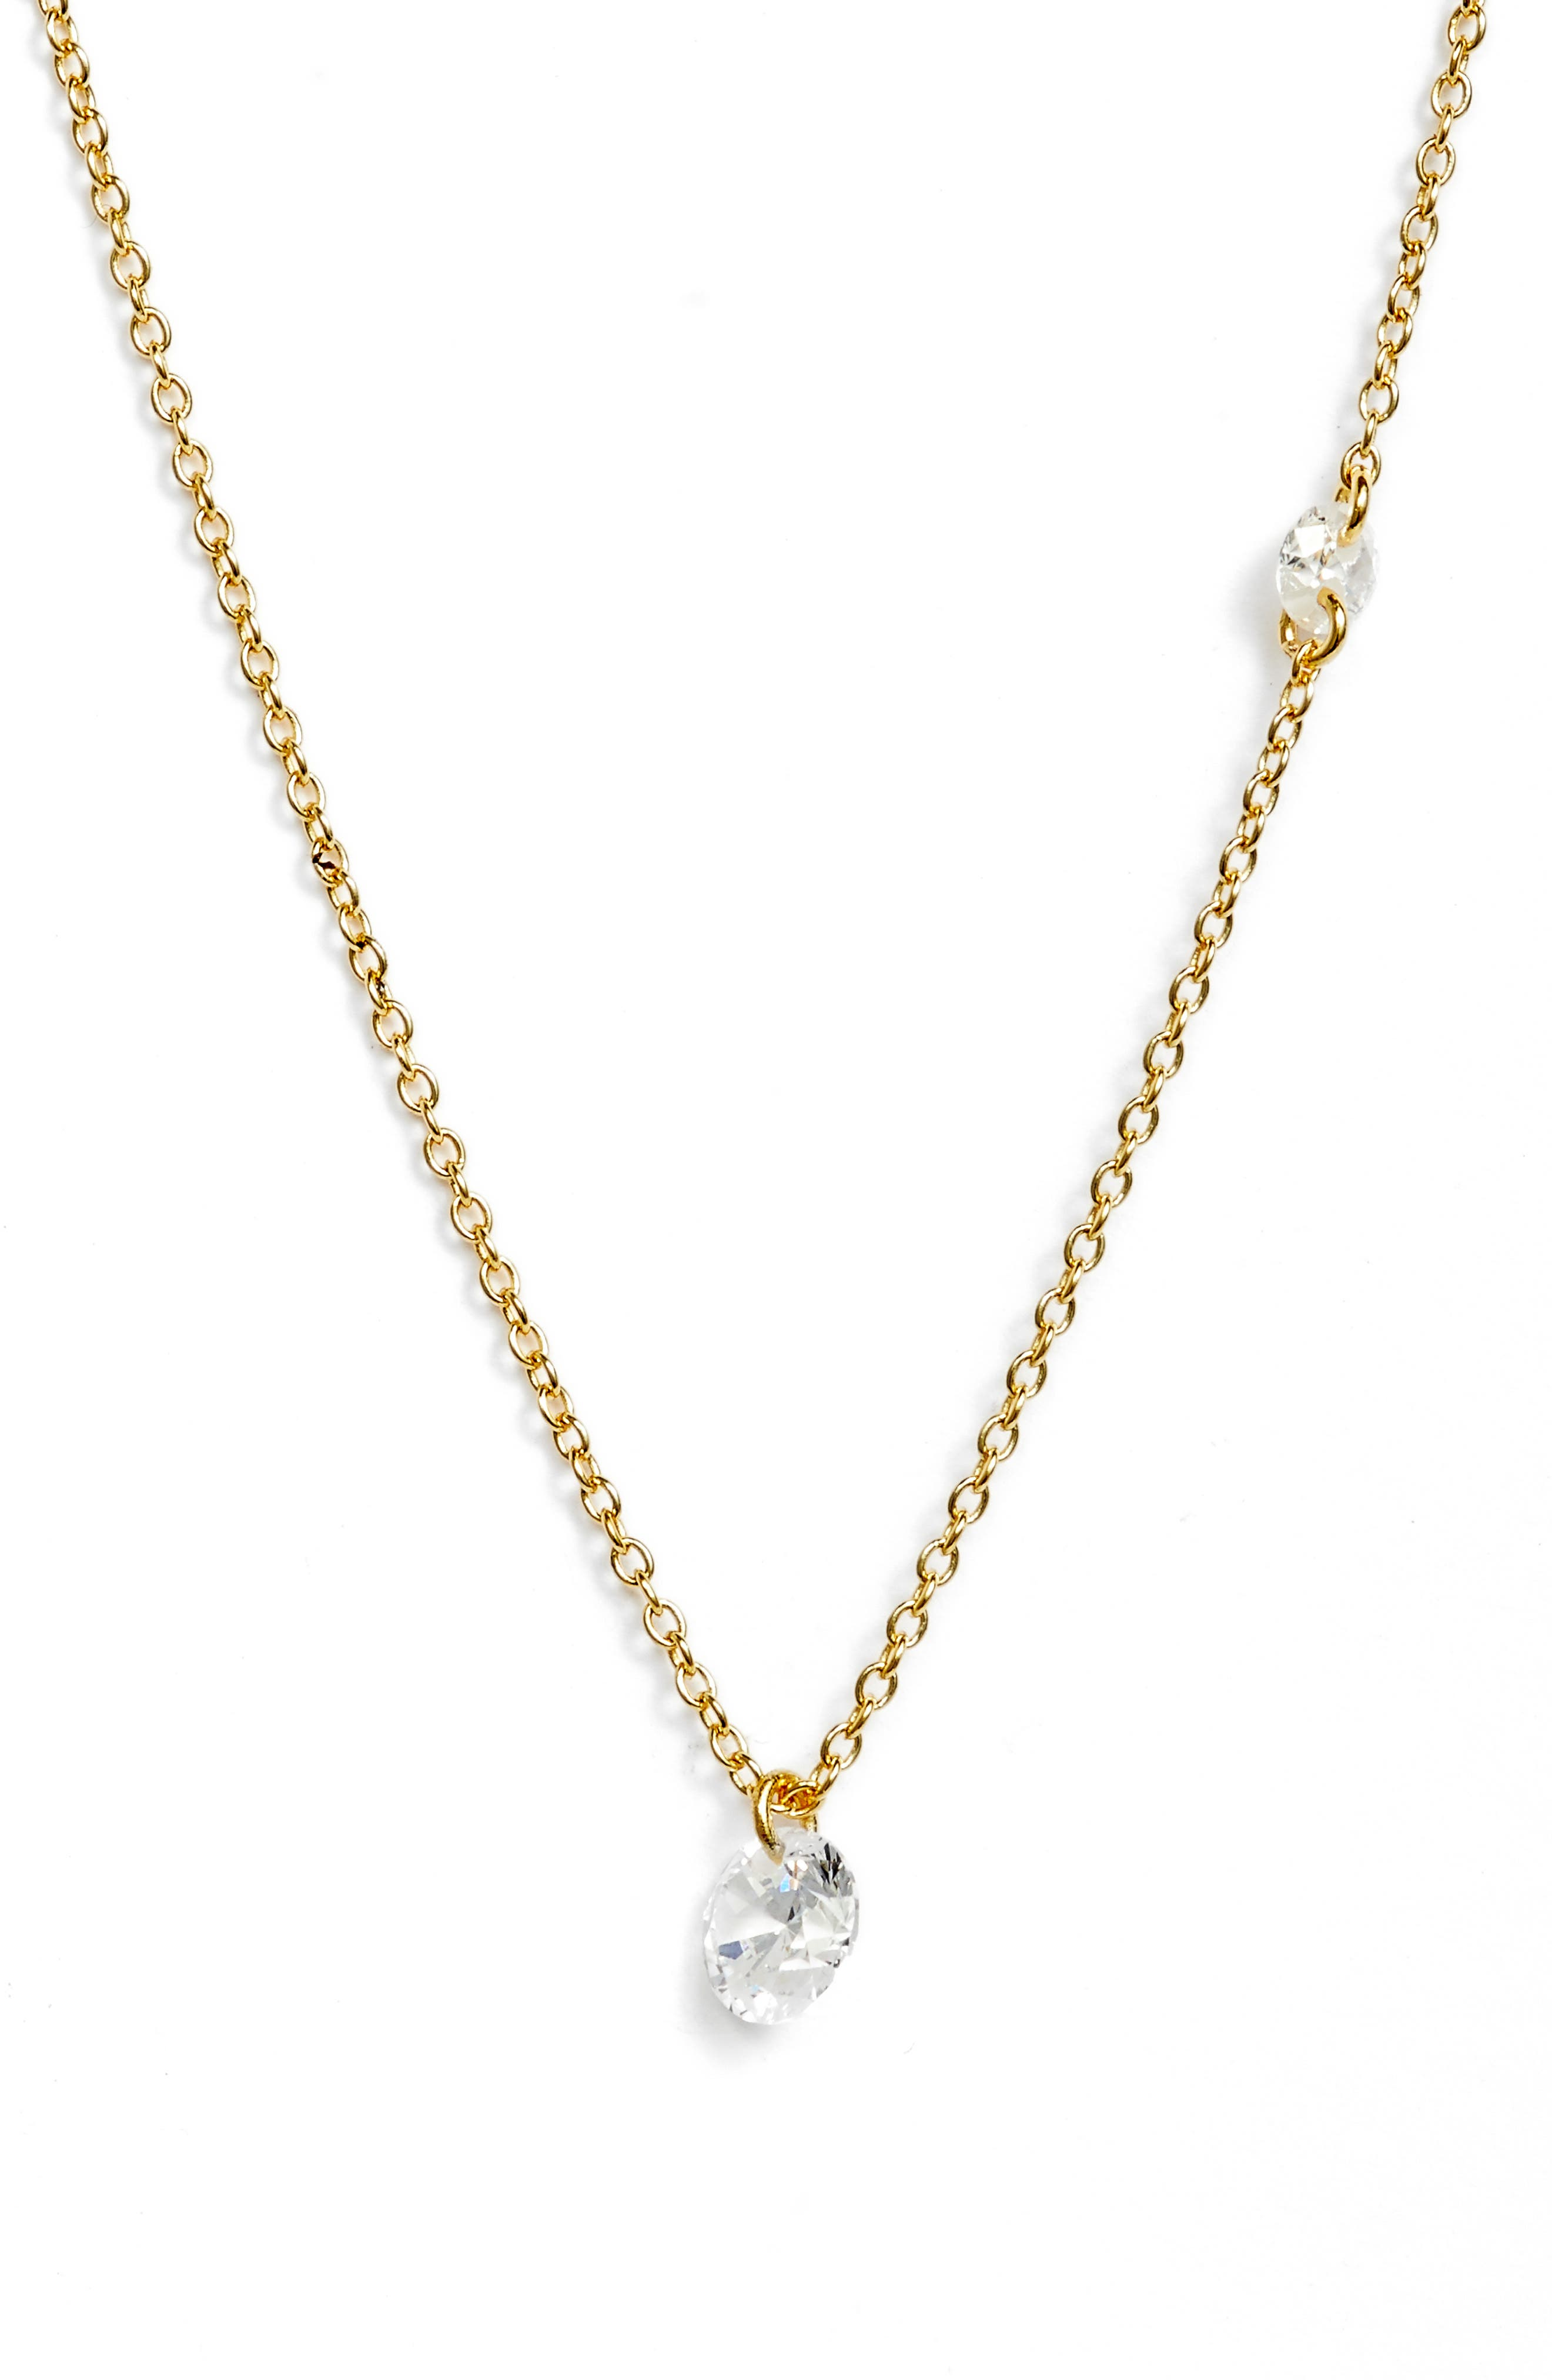 Nordstrom Cubic Zirconia Briolette Pendant Necklace